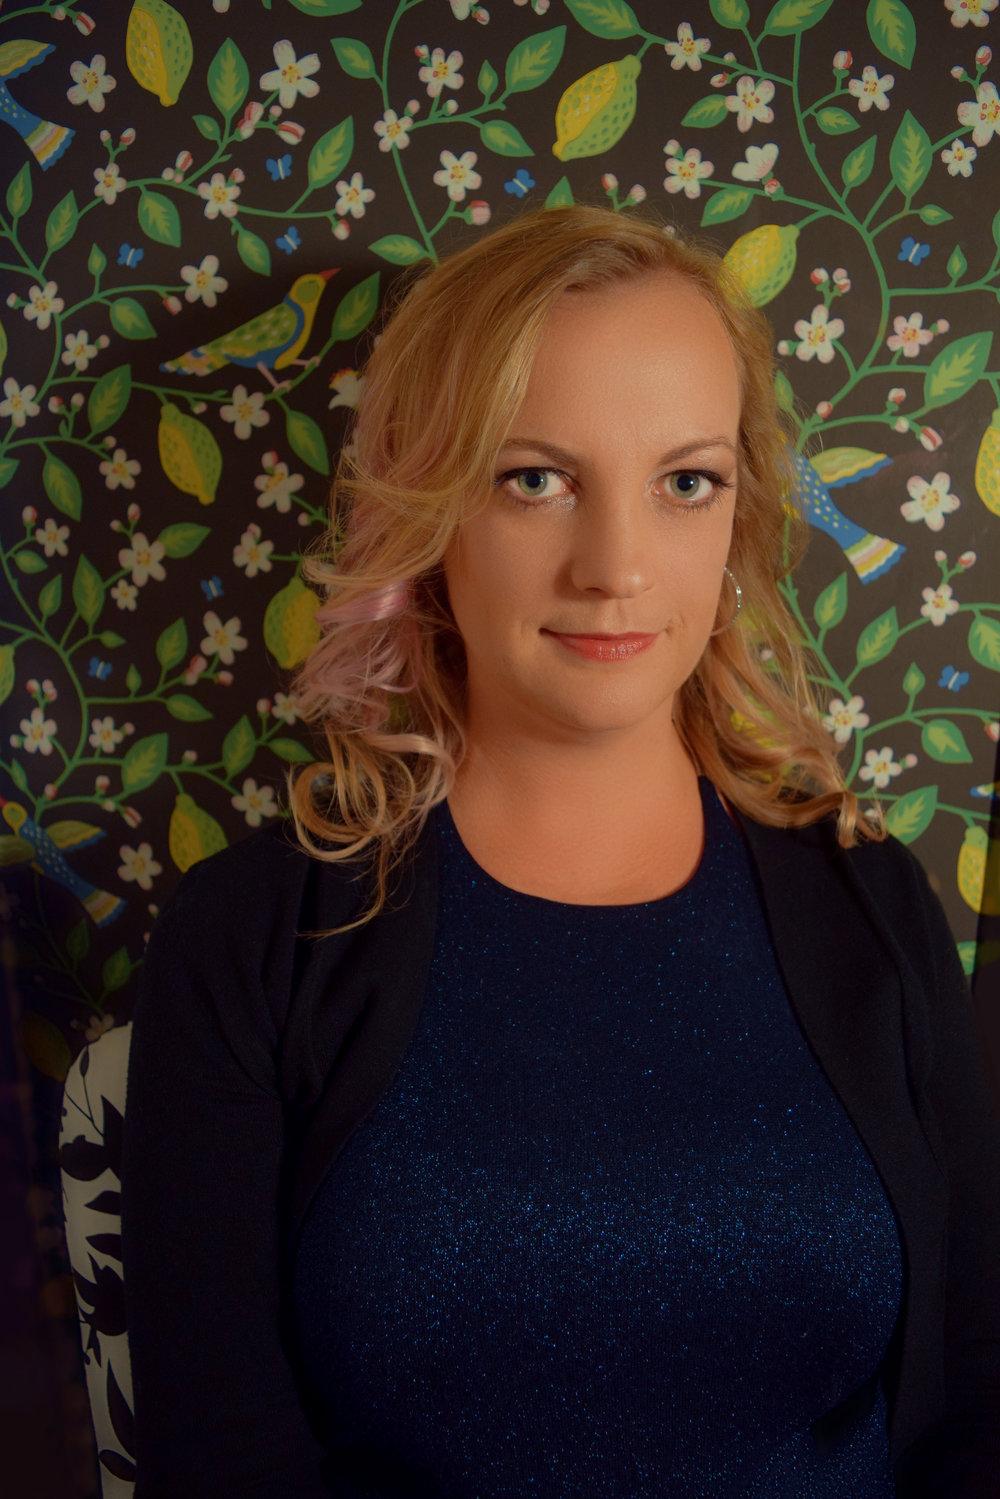 <span>Anna Rosa Lappalainen (FIN)</span><span>Vizor.io</span>